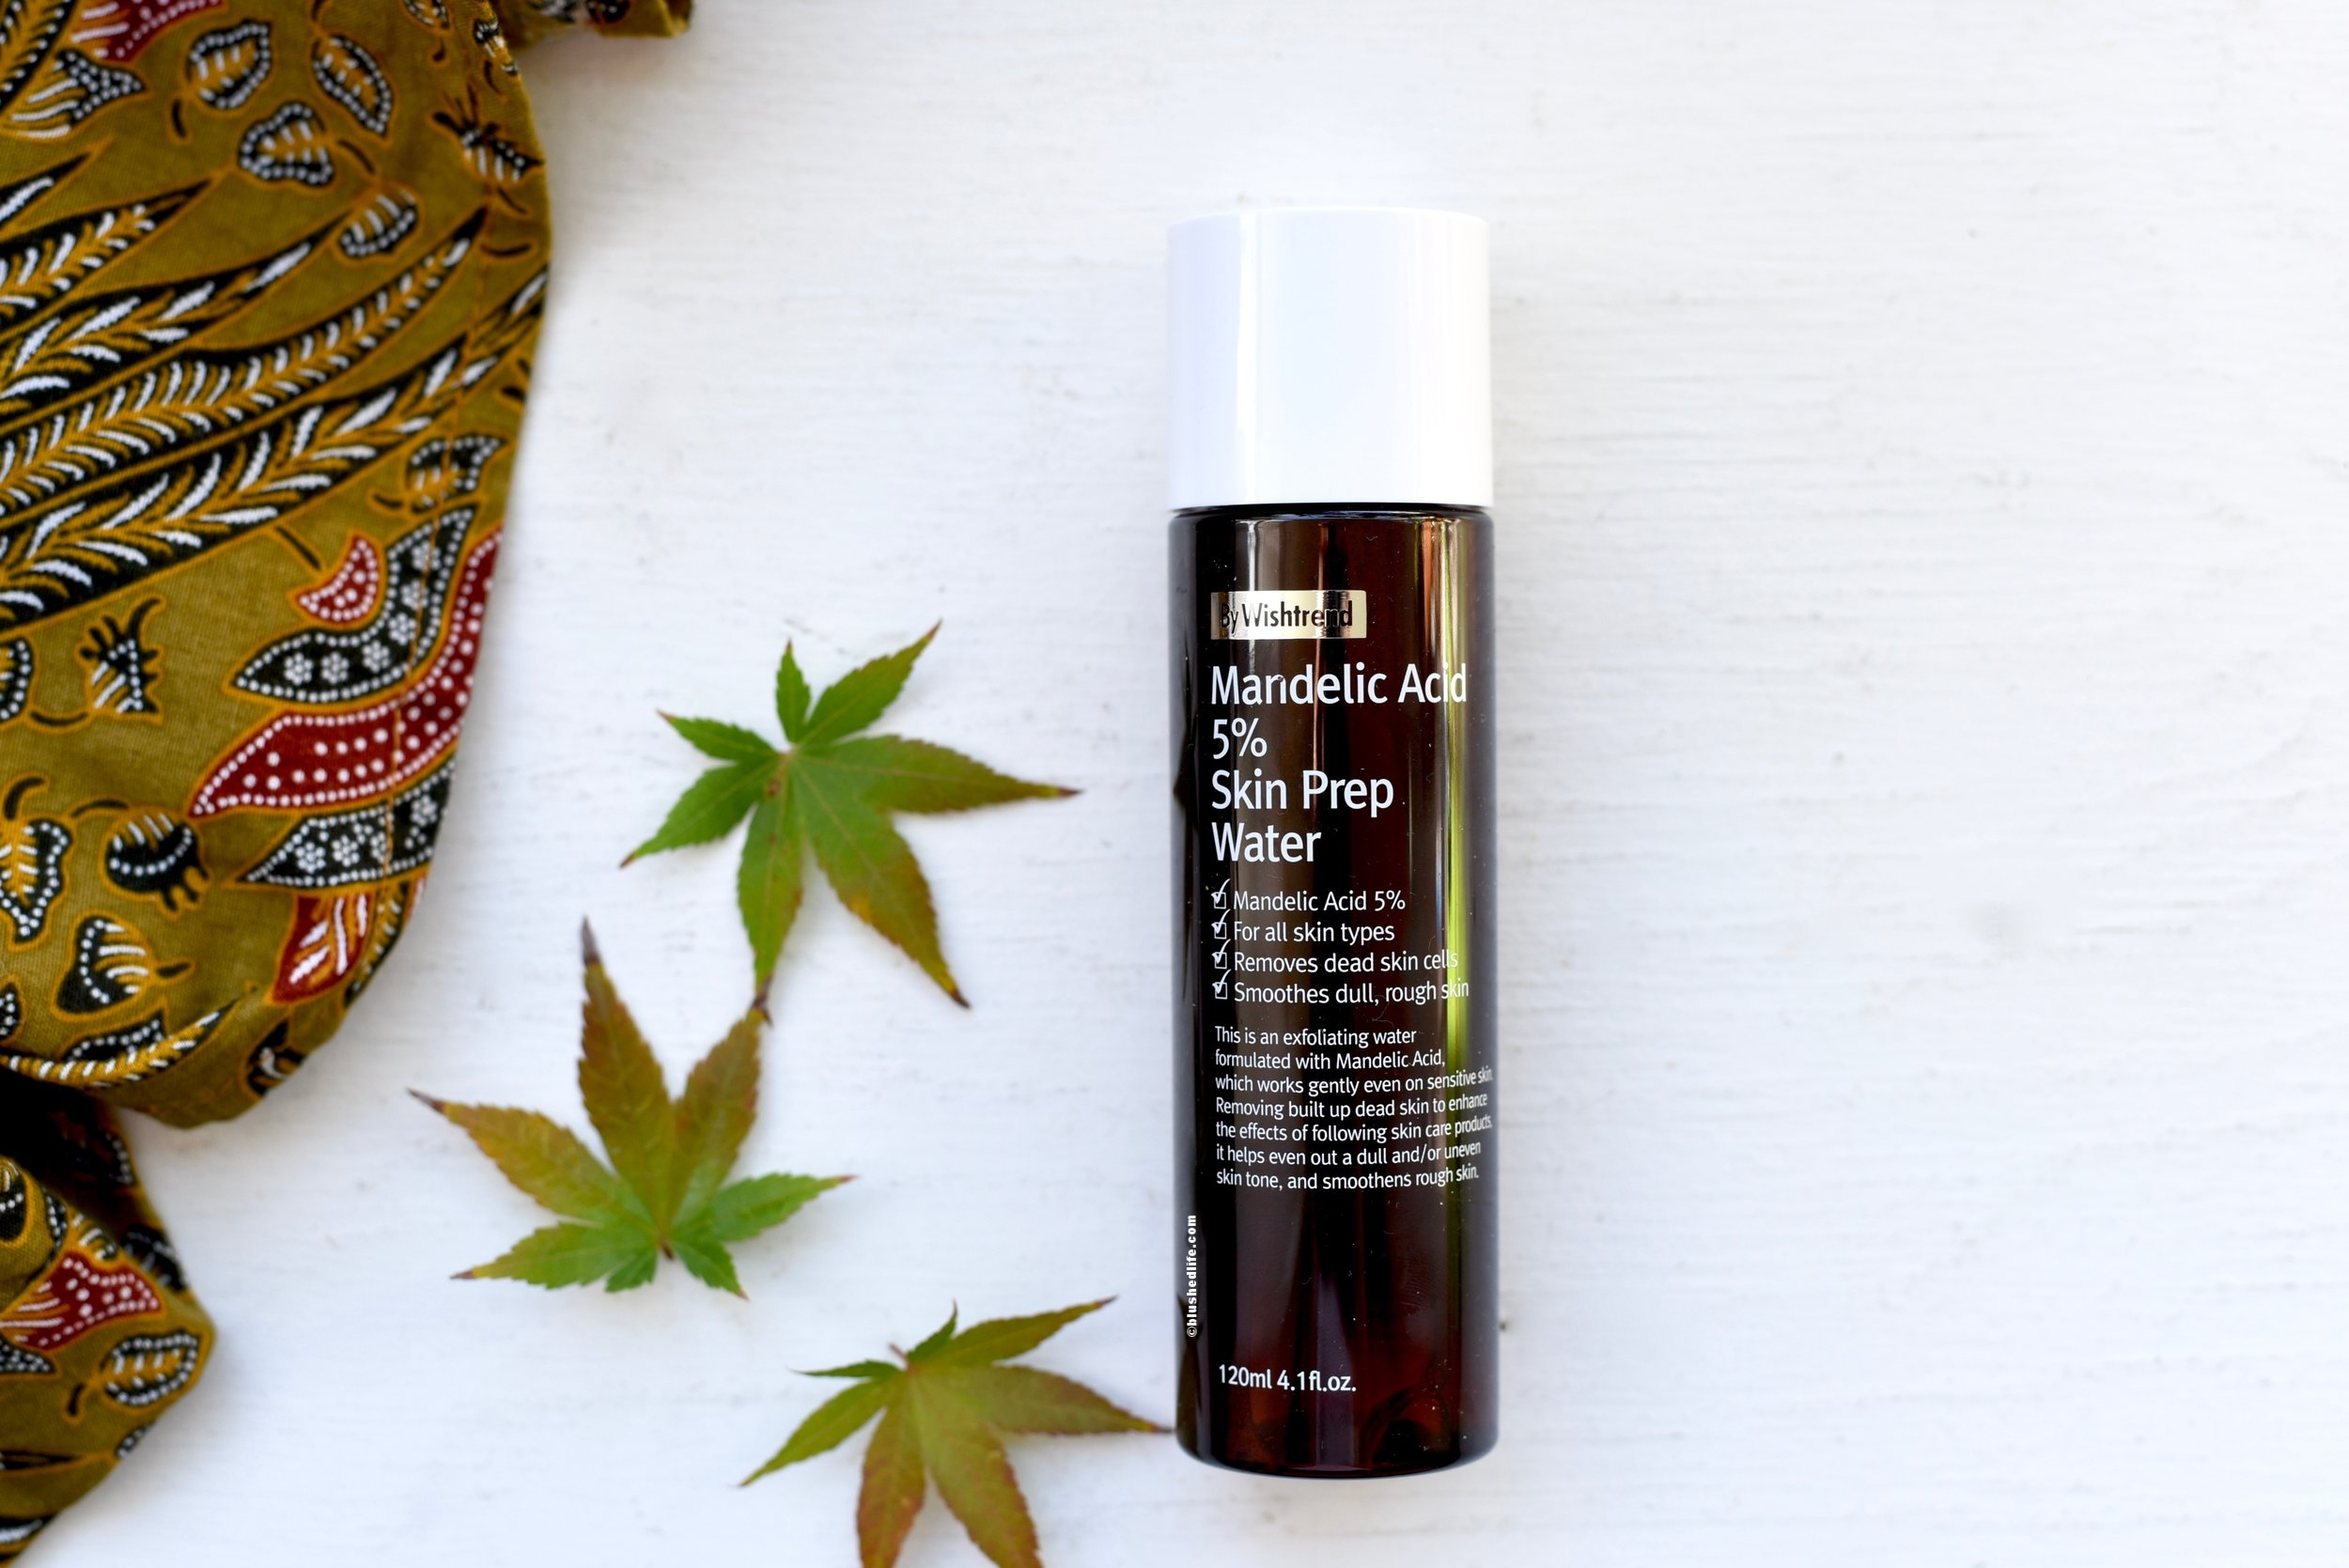 Mandelic Acid Skin Prep Water Review_DSC_9112.jpg